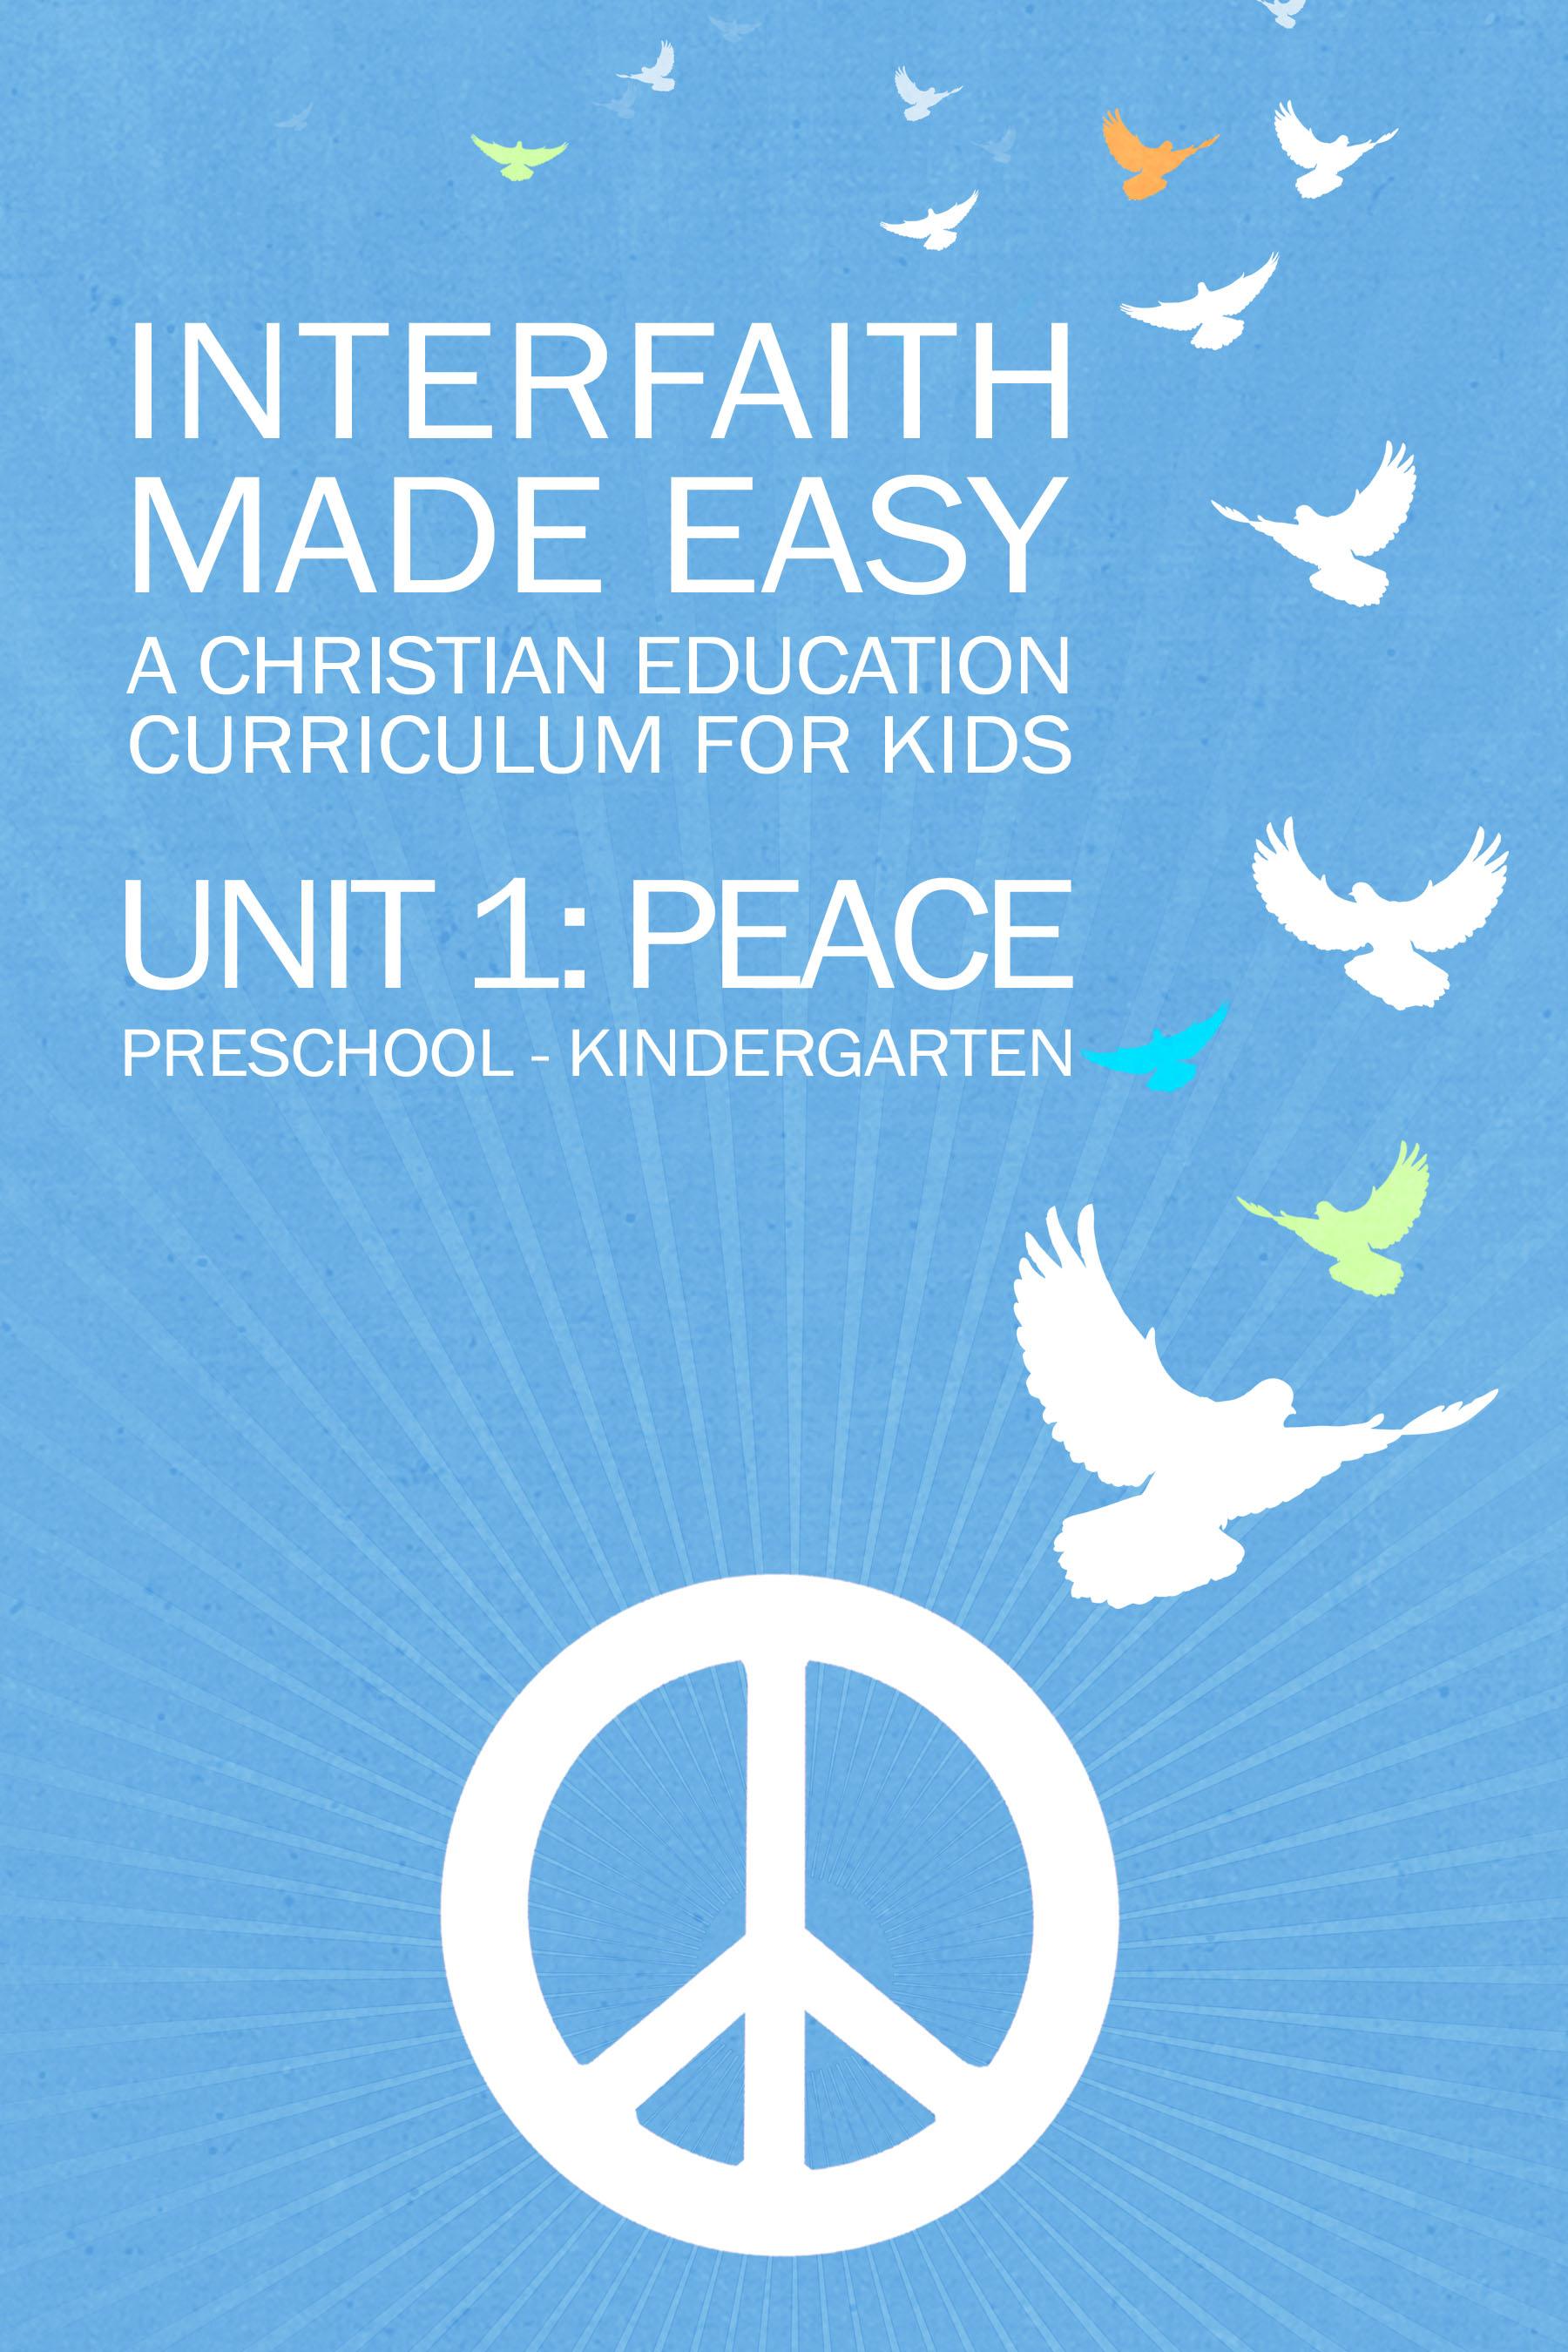 unit-1-peace-age-group-1.jpg